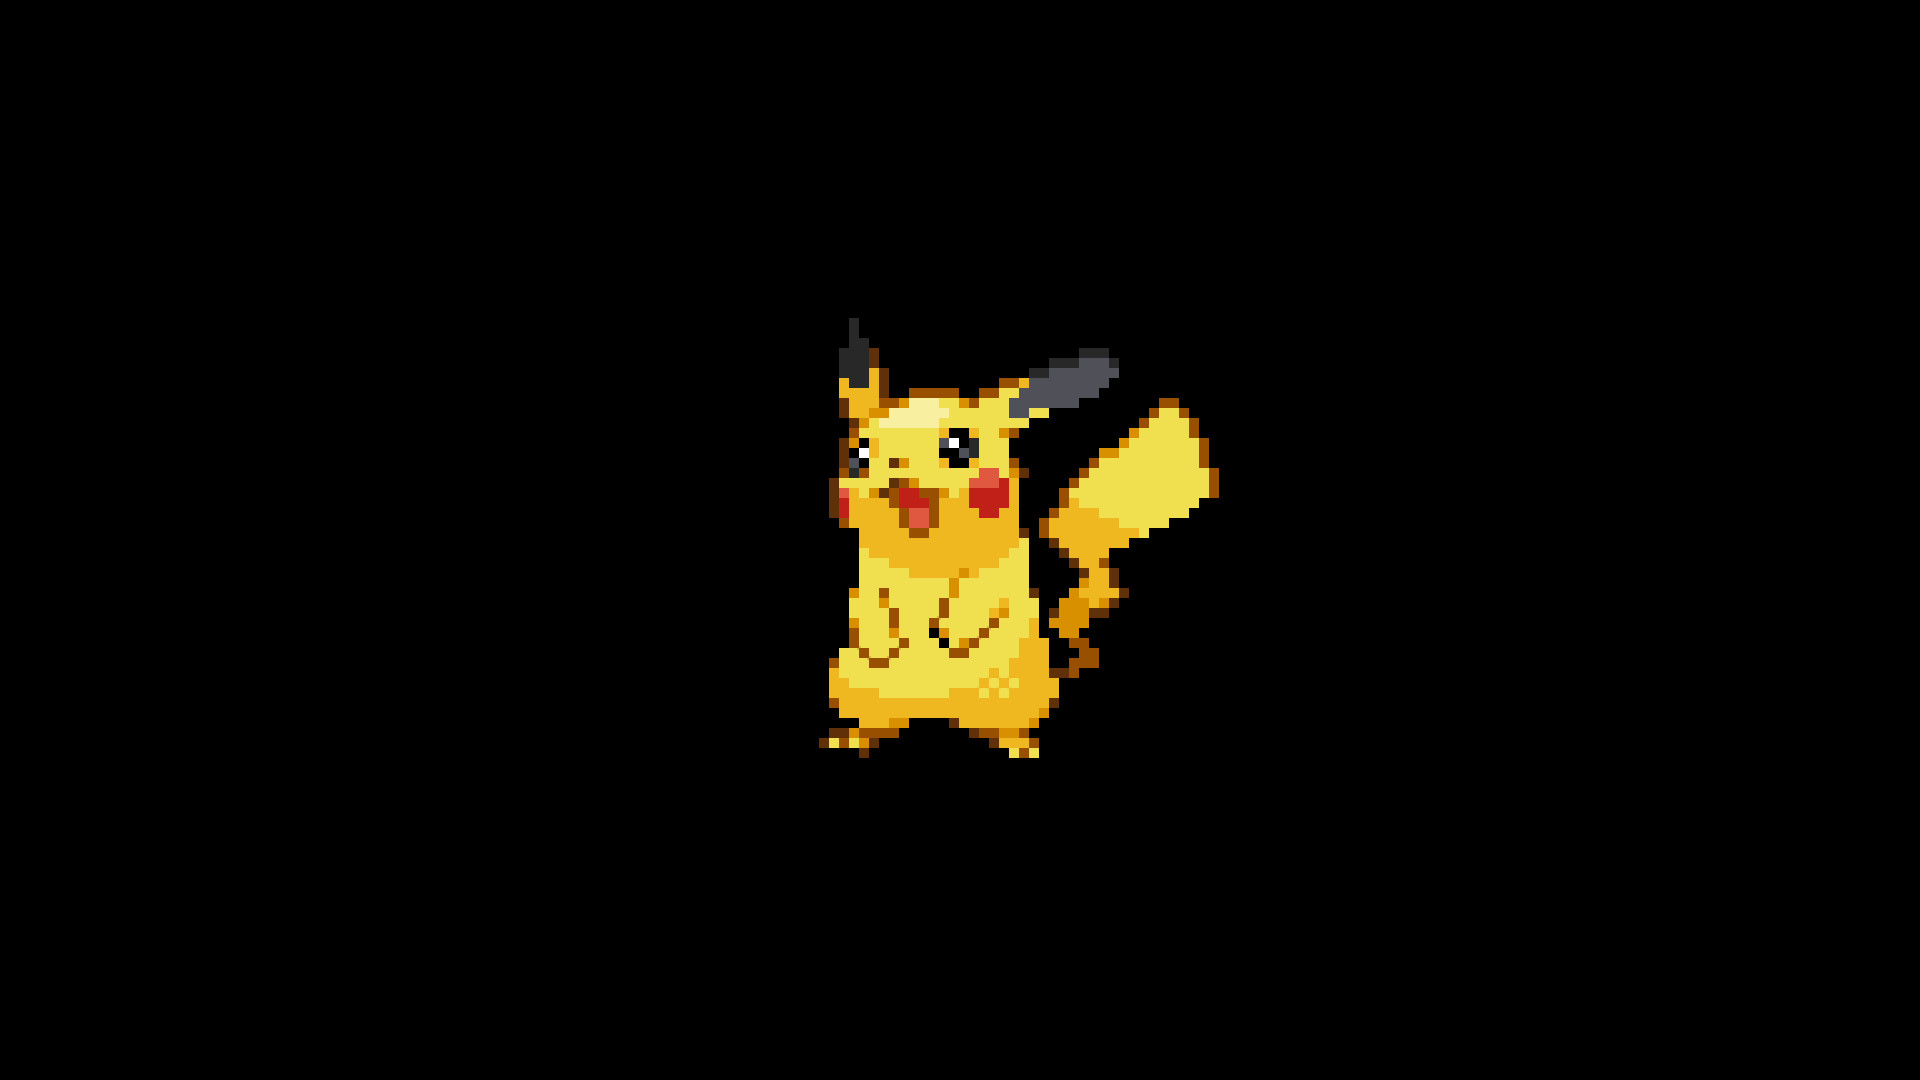 Pokemon 8 Bit Minimalism